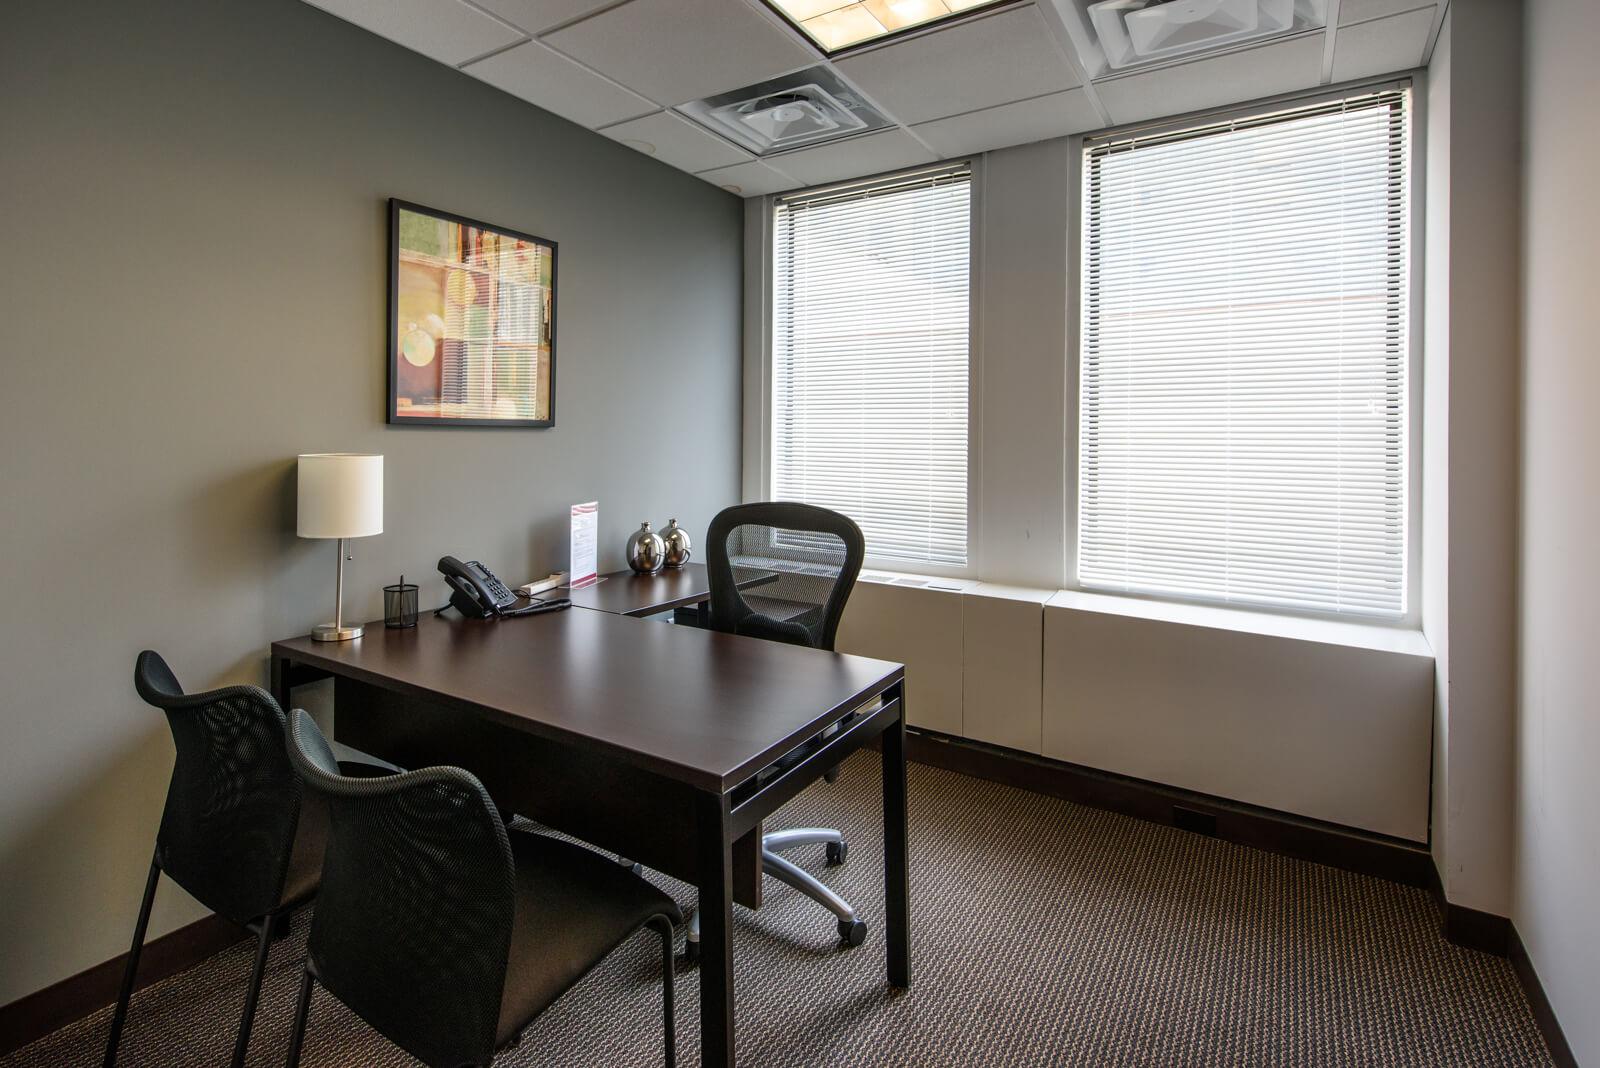 Office space in Downtown Oak Park, IL